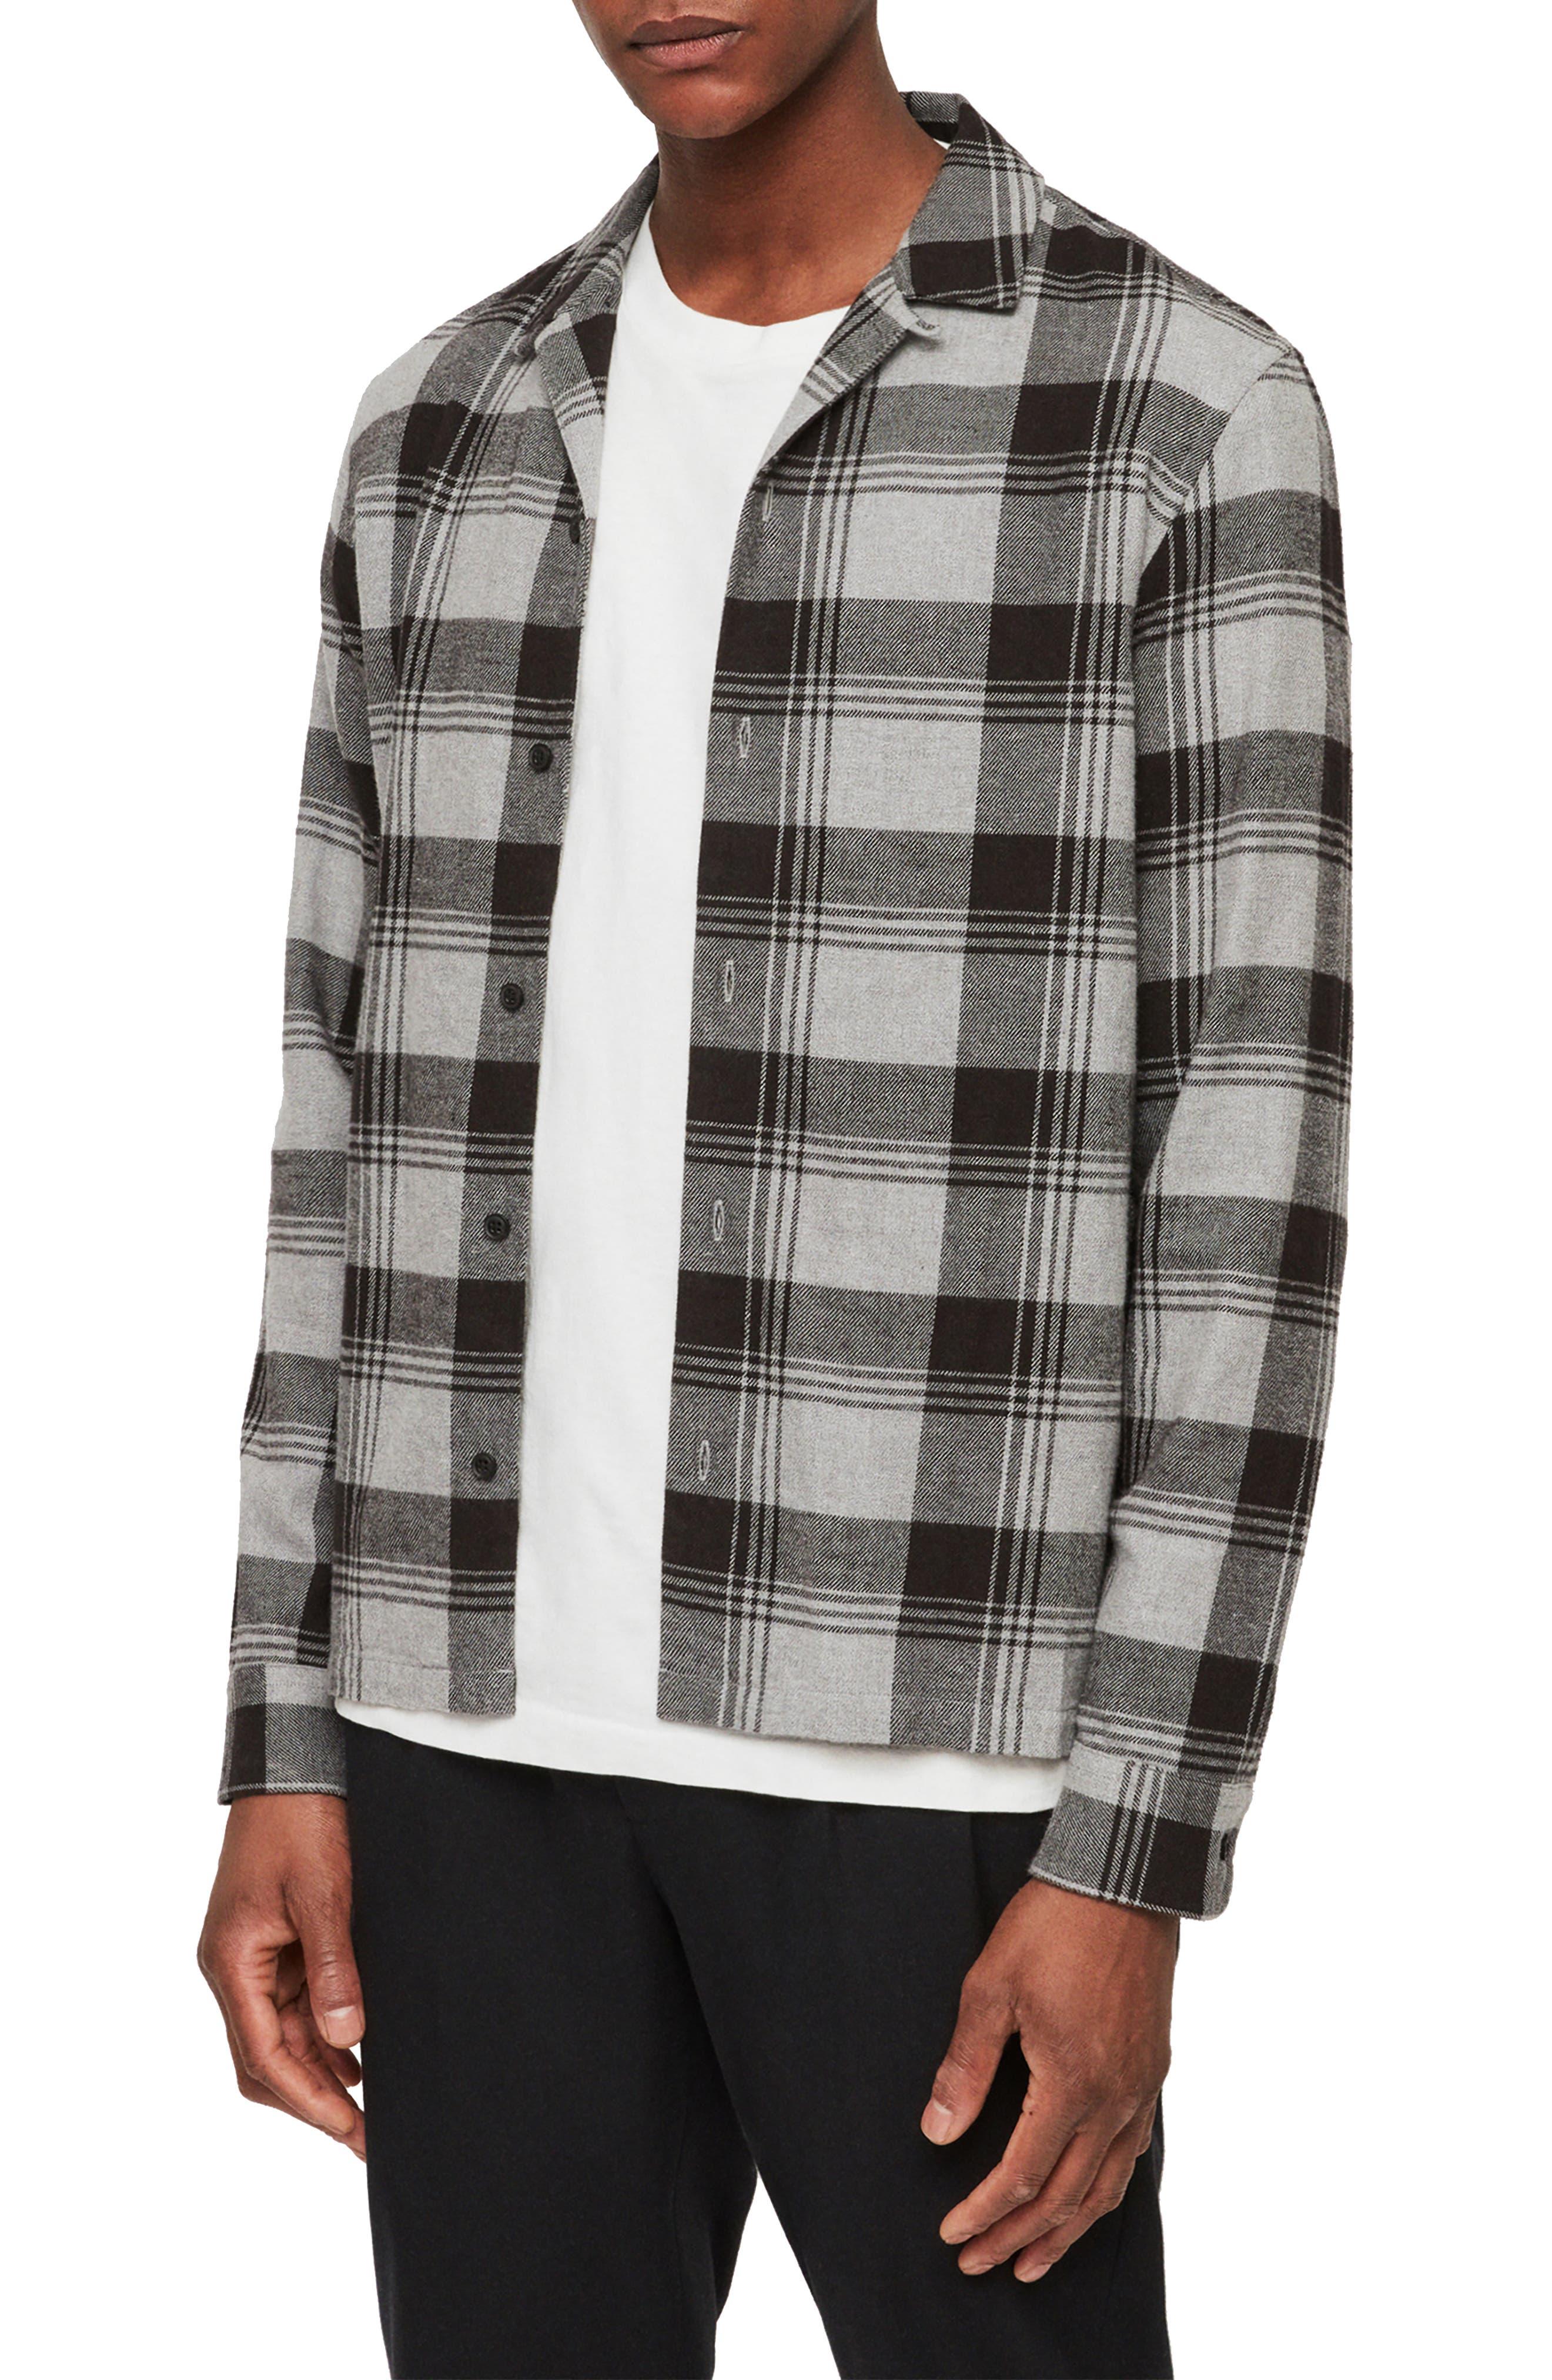 Danby Flannel Shirt Jacket,                             Main thumbnail 1, color,                             BLACK/ ECRU WHITE